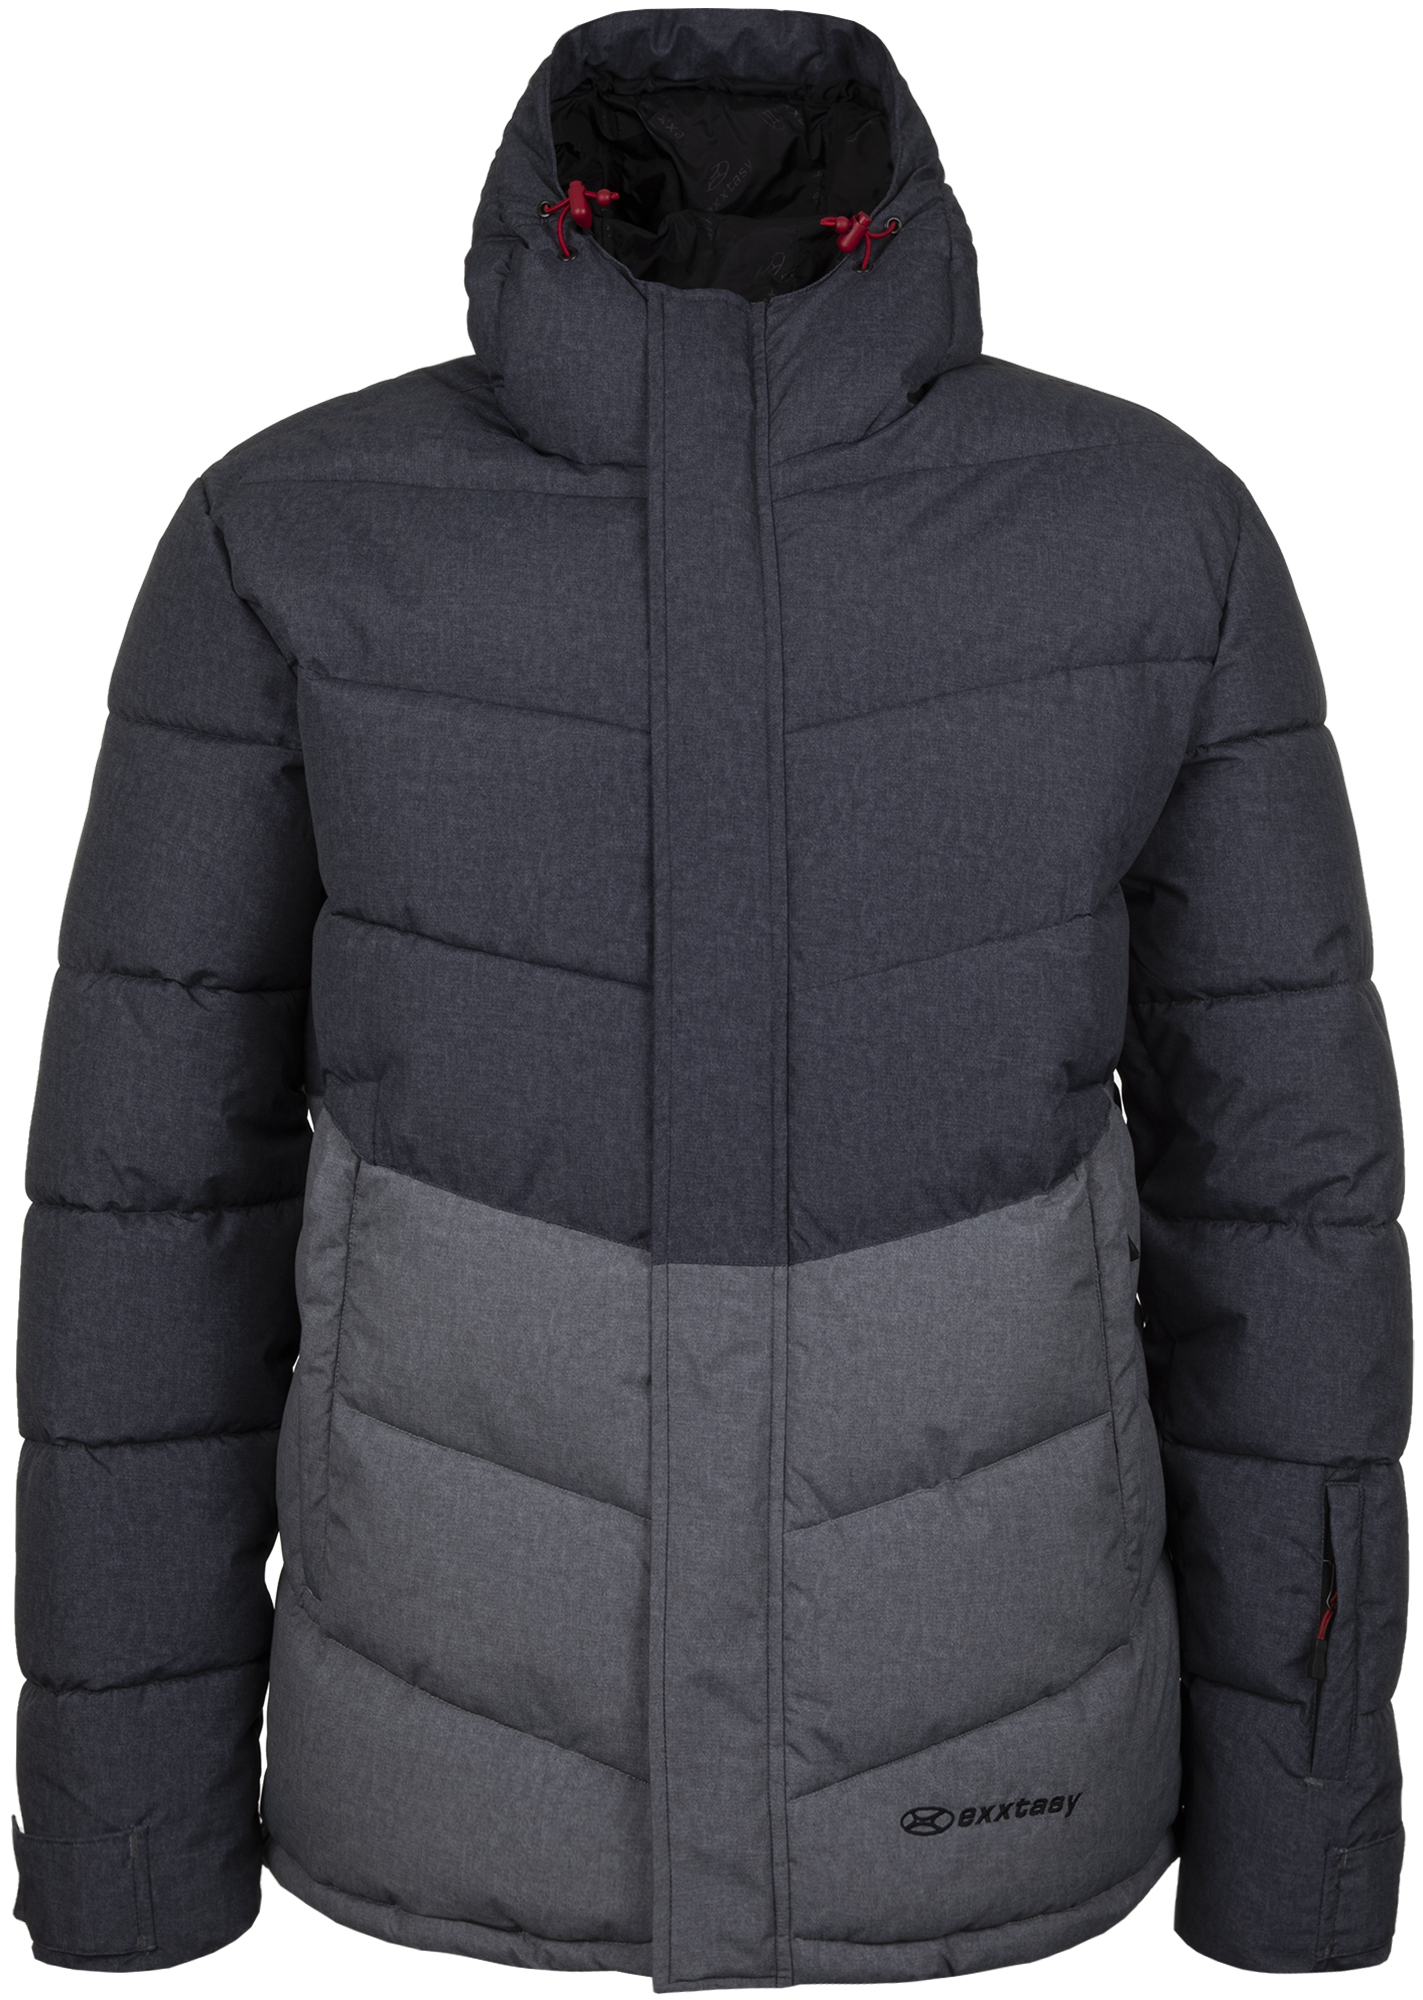 Exxtasy Куртка утепленная мужская Exxtasy Verres, размер 52-54